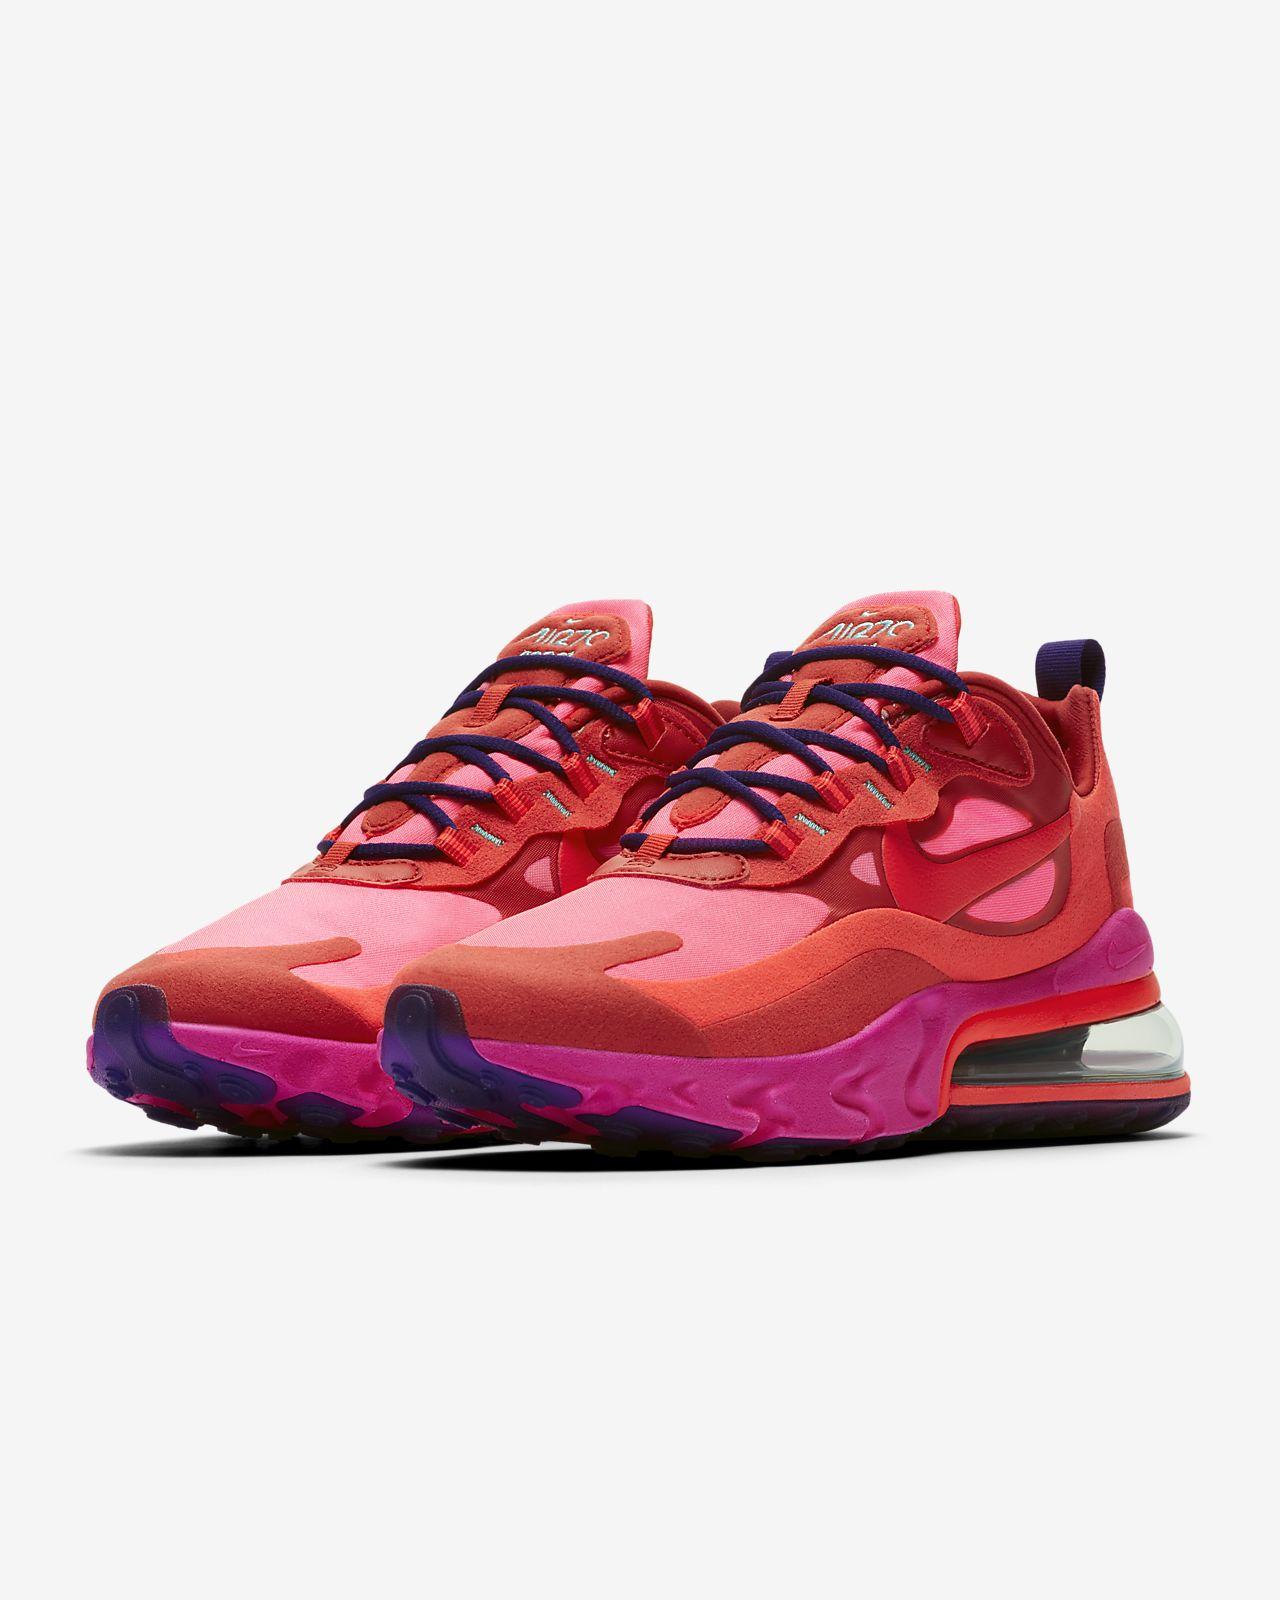 Nike Air Max 270 university goldblackpsychic pinkwhite au